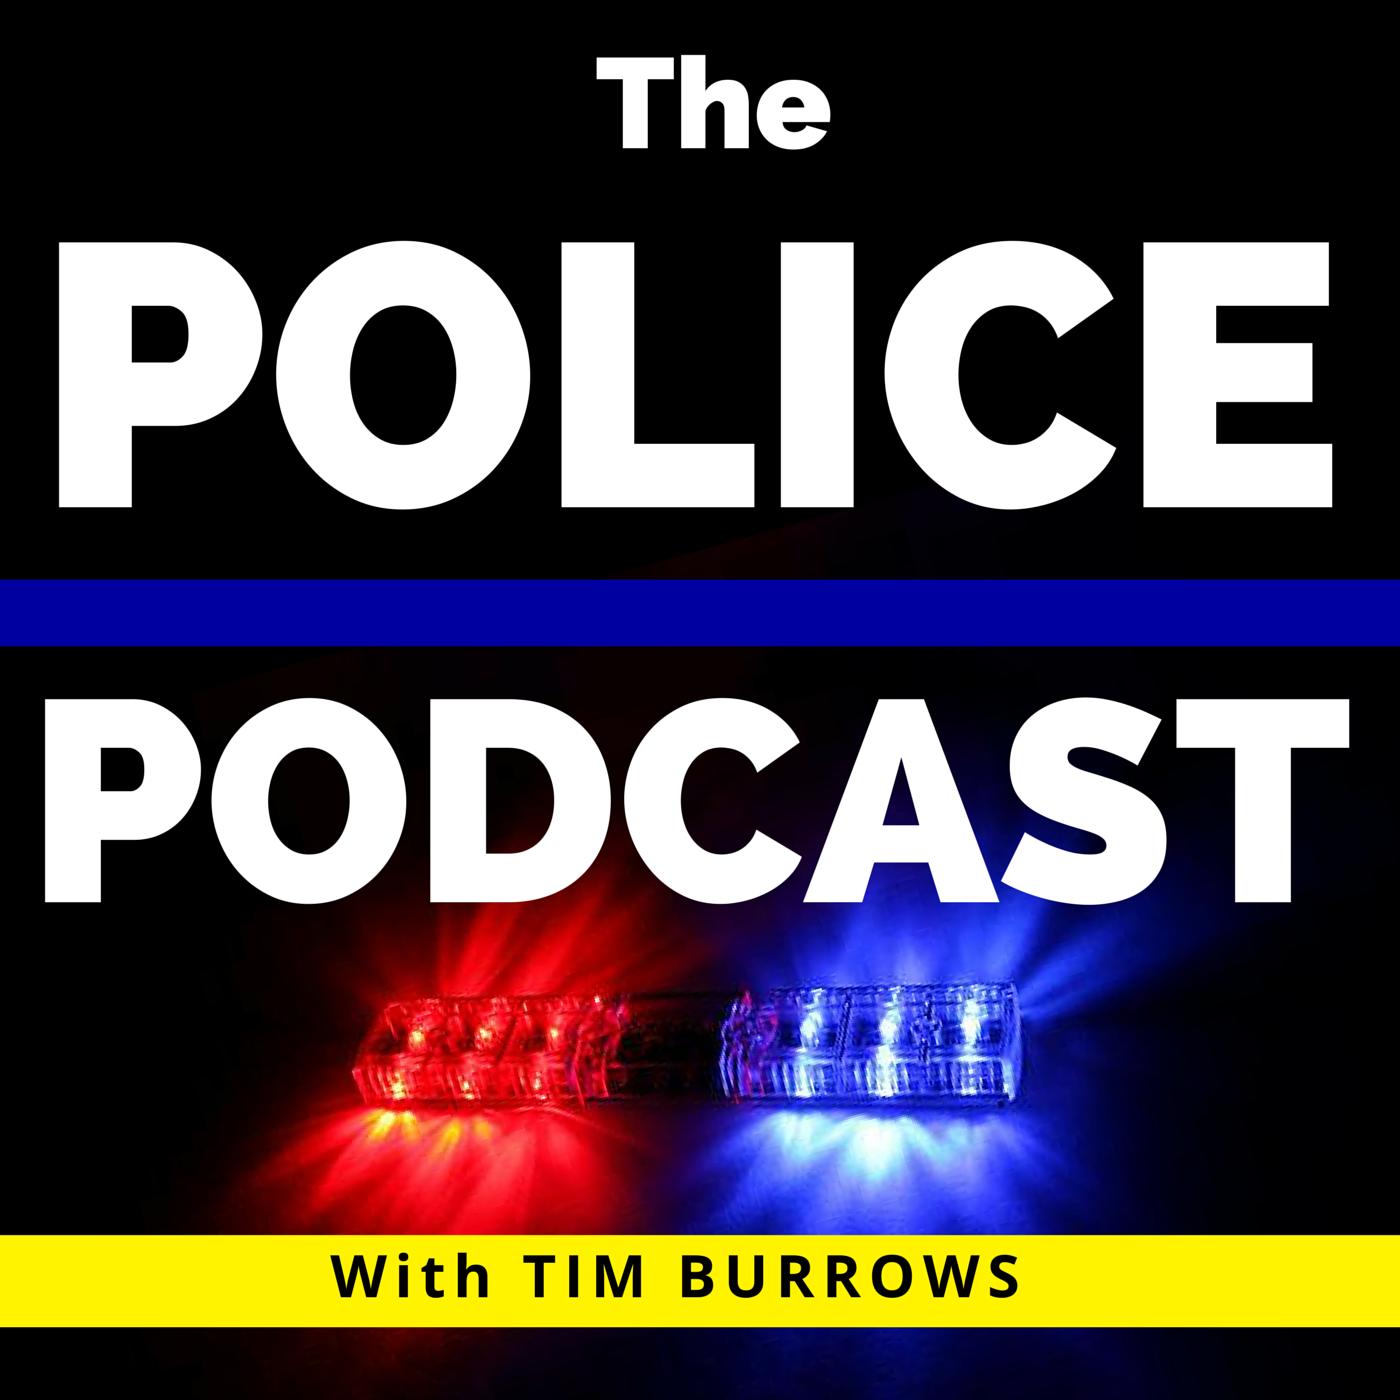 The Police Podcast logo